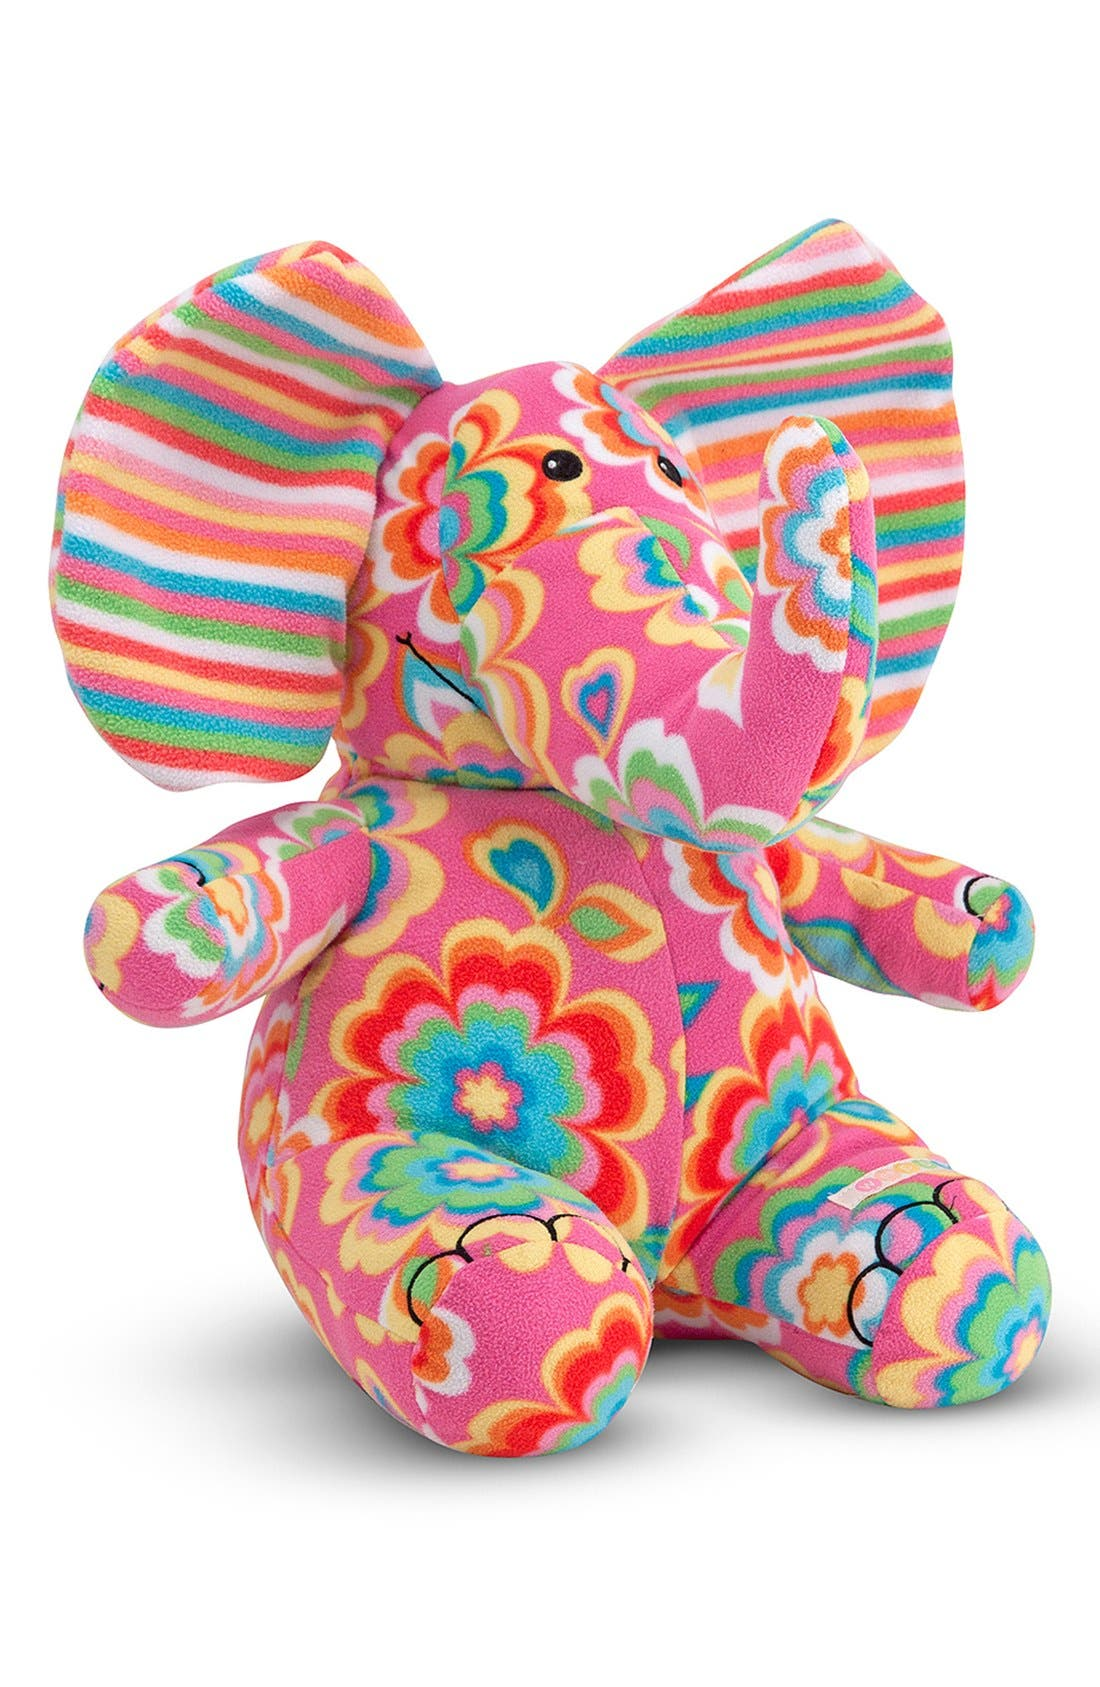 Main Image - Melissa & Doug 'Beeposh - Sally Elephant' Plush Toy